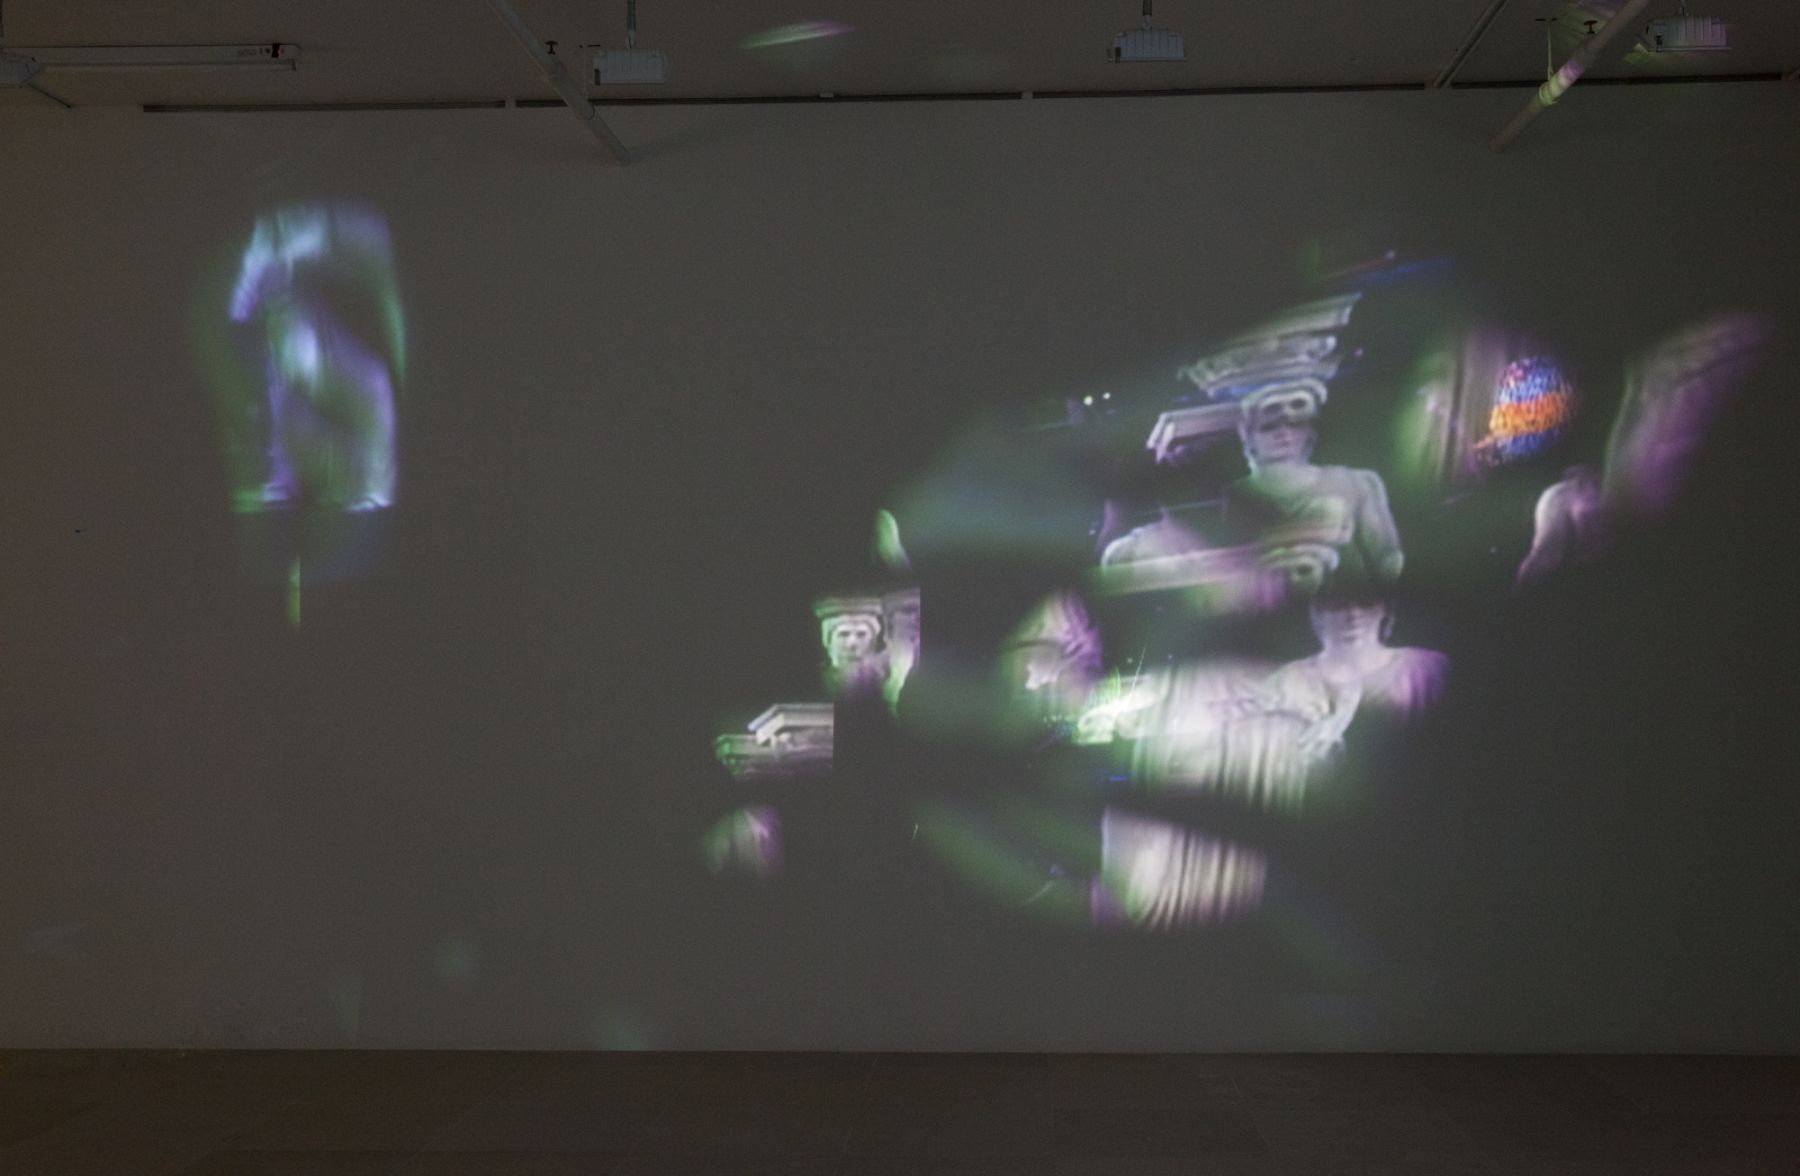 Trisha Baga, Cloud Atlas, 2012